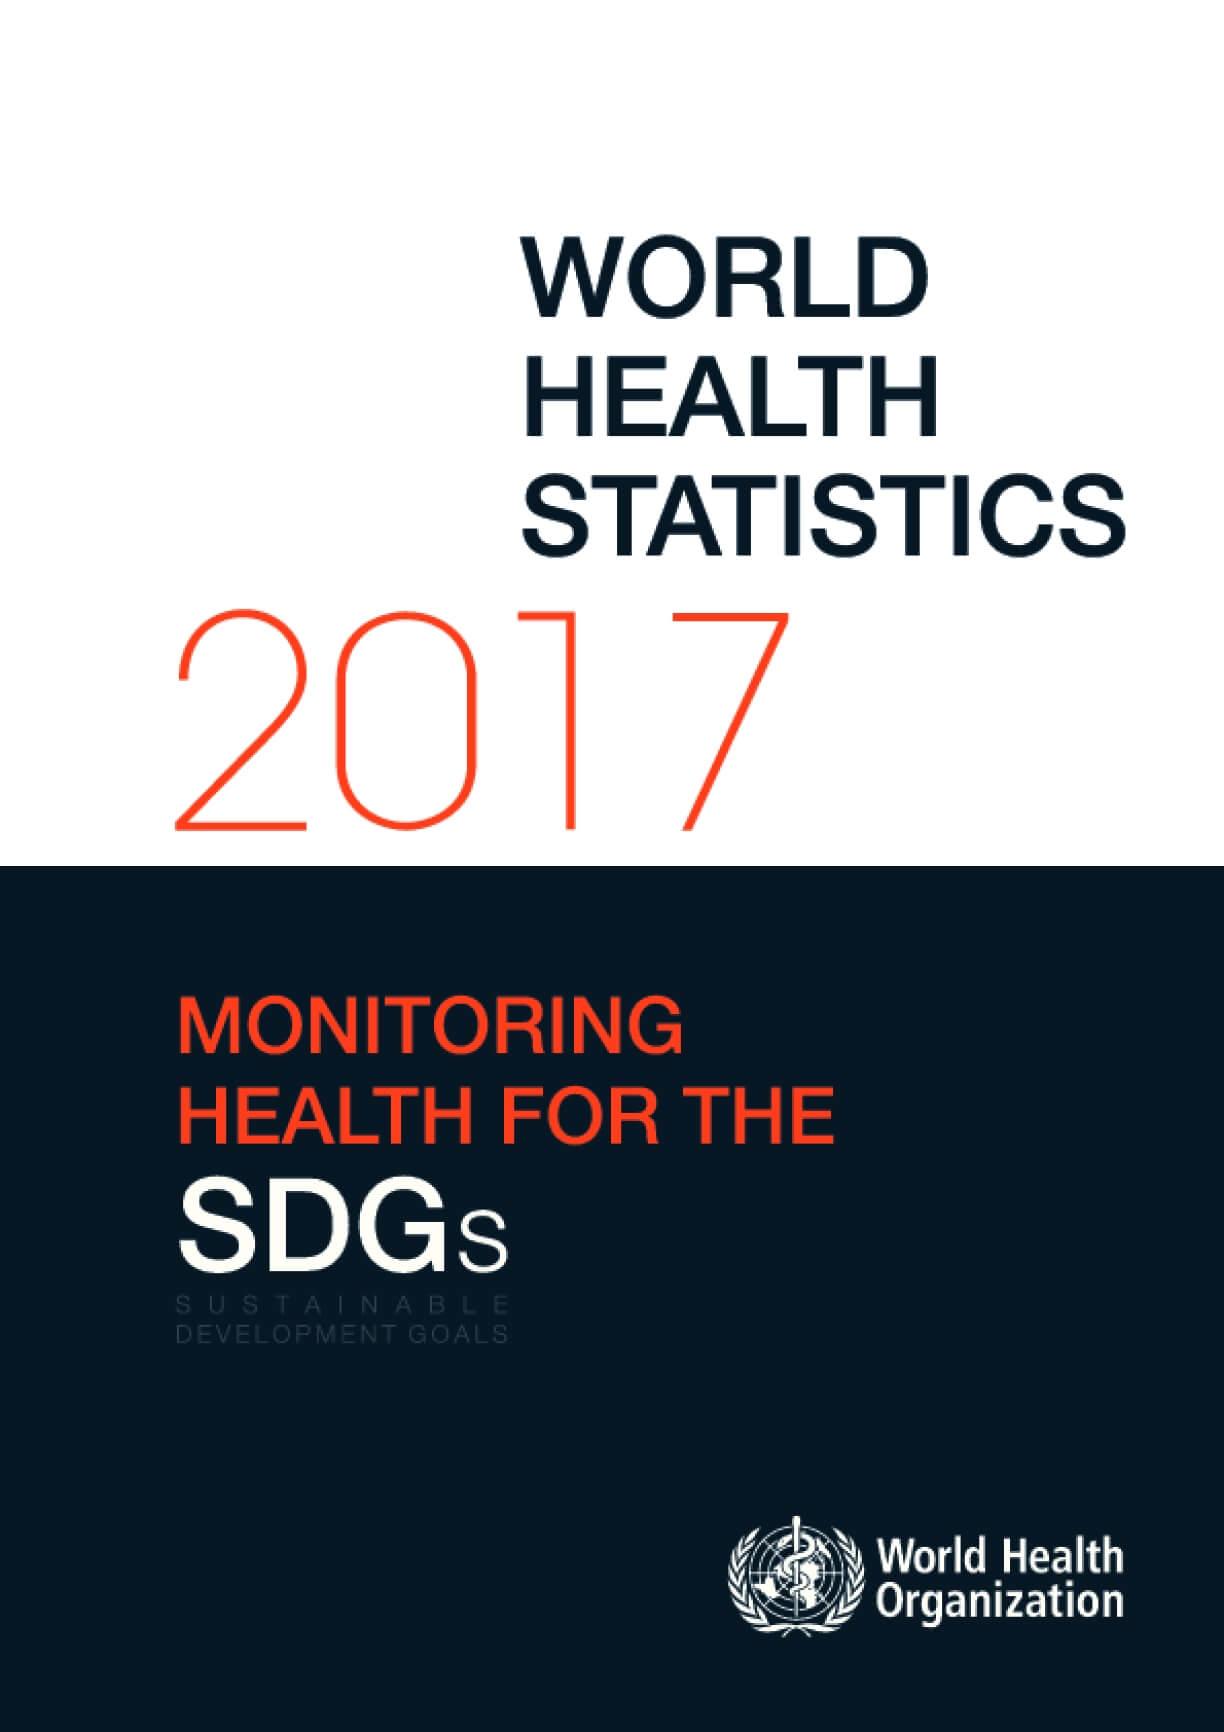 World Health Statistics 2017: Monitoring Health for the SDGs